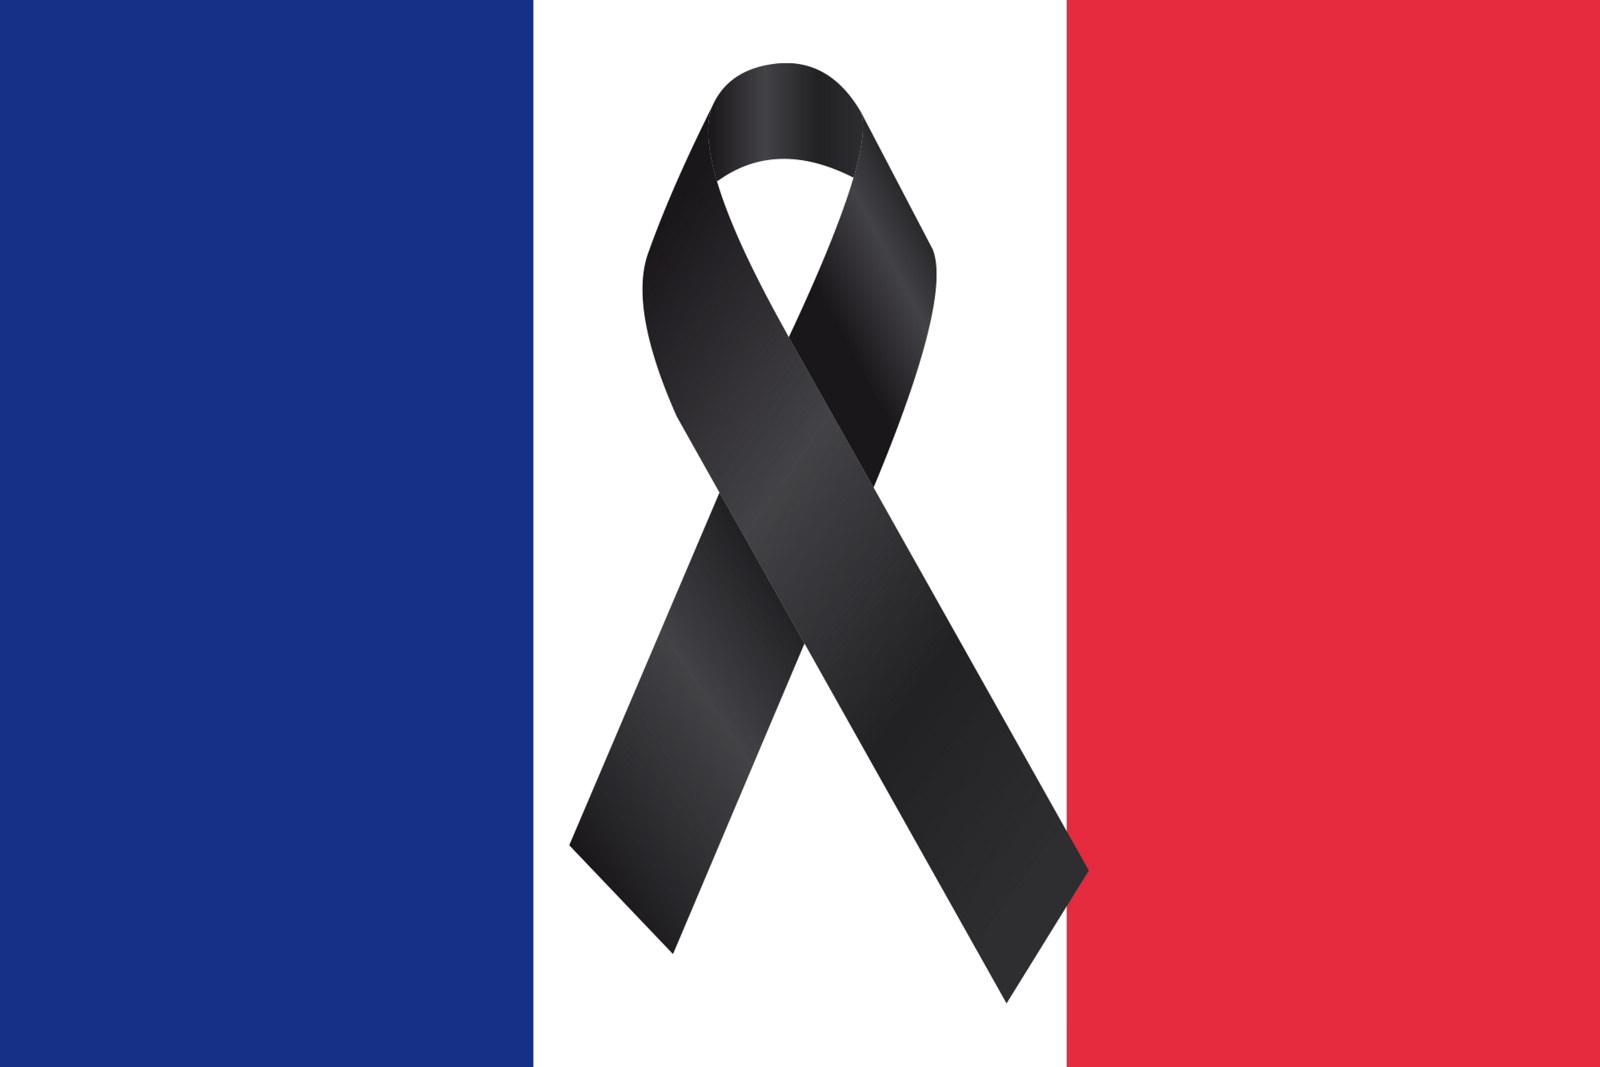 france_solidarity